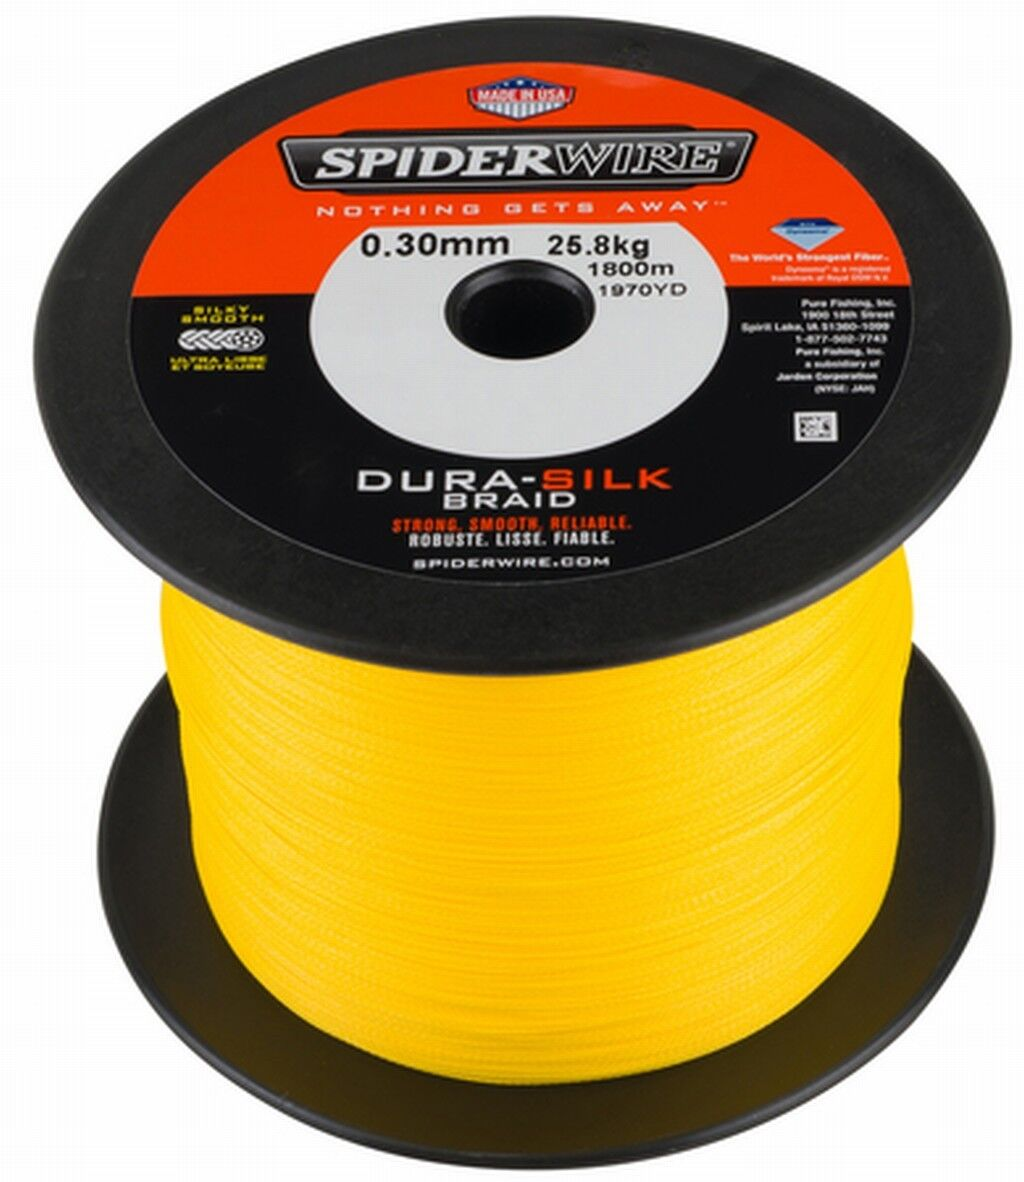 SPIDERWIRE DURA-SILK 1800m 1800m 1800m Big Spools - All Größes - Gelb, Grün d4ded9